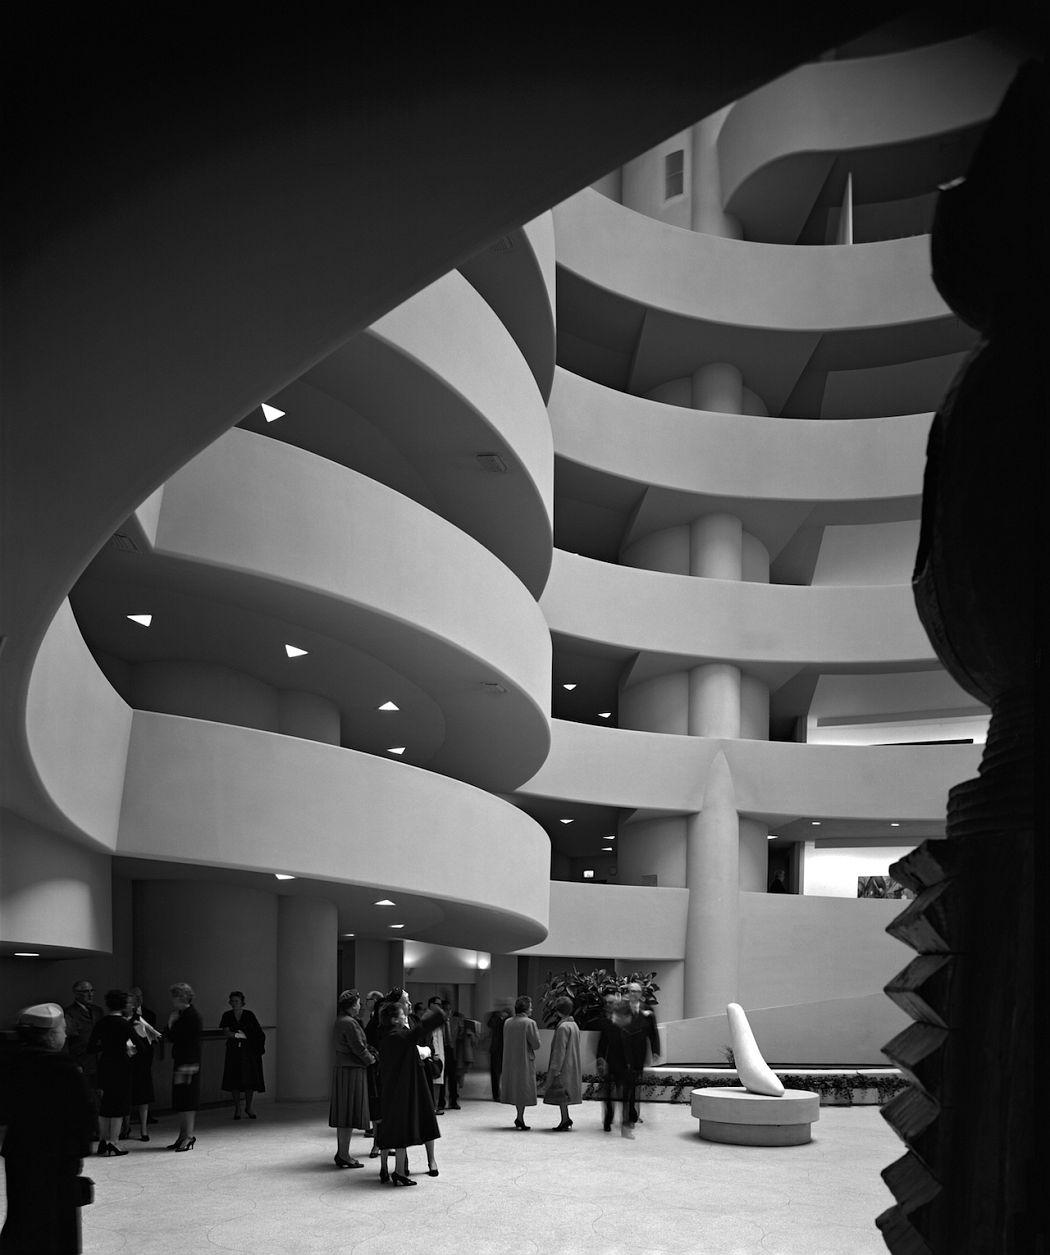 Ezra Stoller Guggenheim Museum. Frank Lloyd Wright. New York, NY, 1959 © Ezra Stoller, Courtesy Yossi Milo Gallery, New York